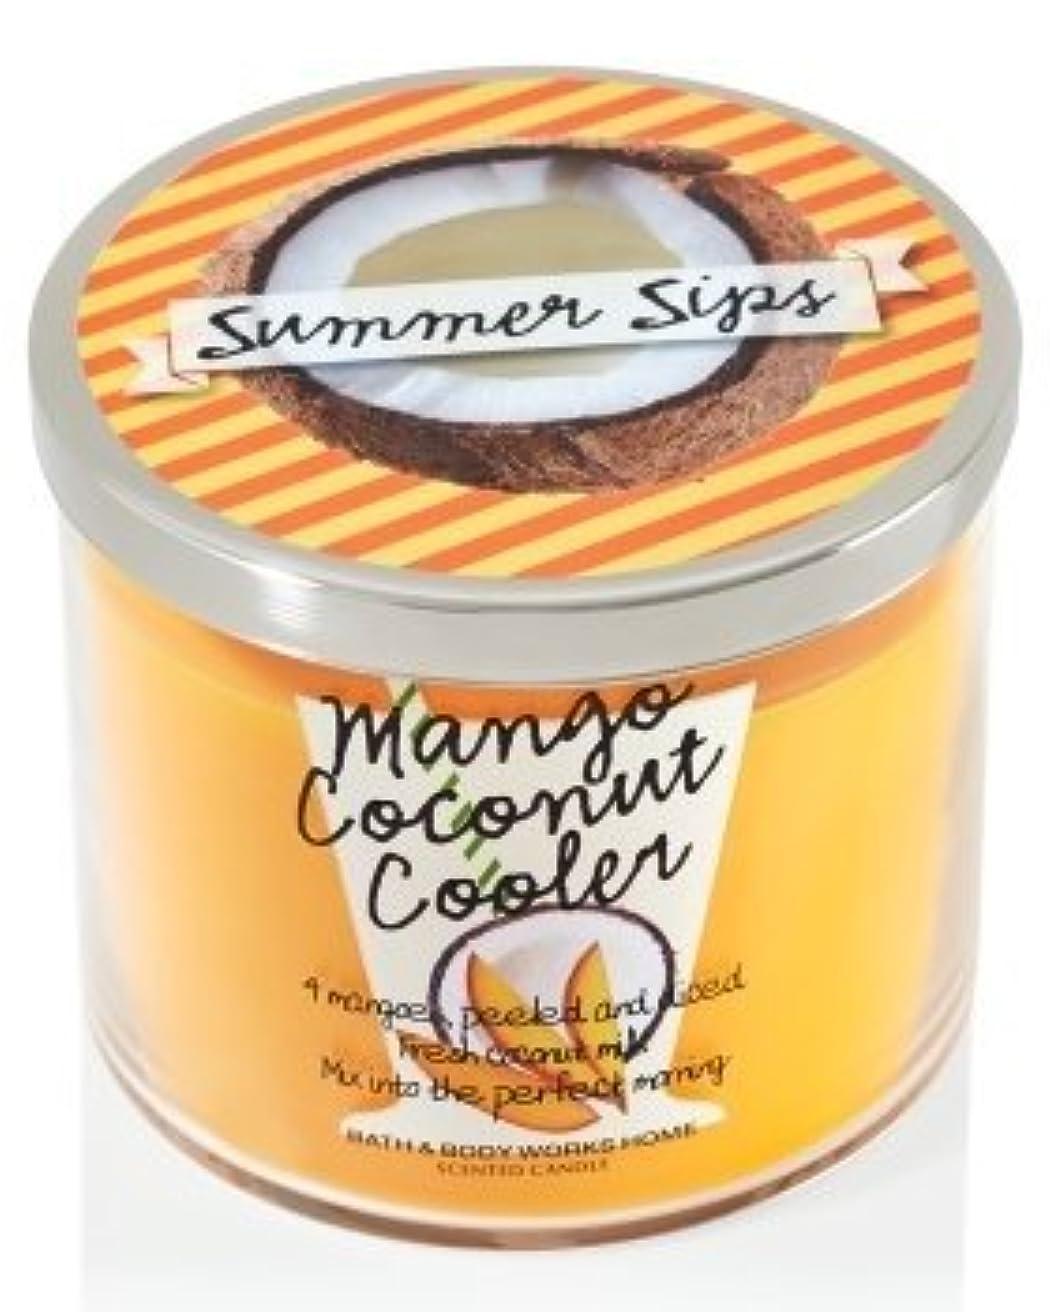 Bath & Body Works 3 Wick Candle Summer Sips Mango Coconut Cooler by Bath & Body Works